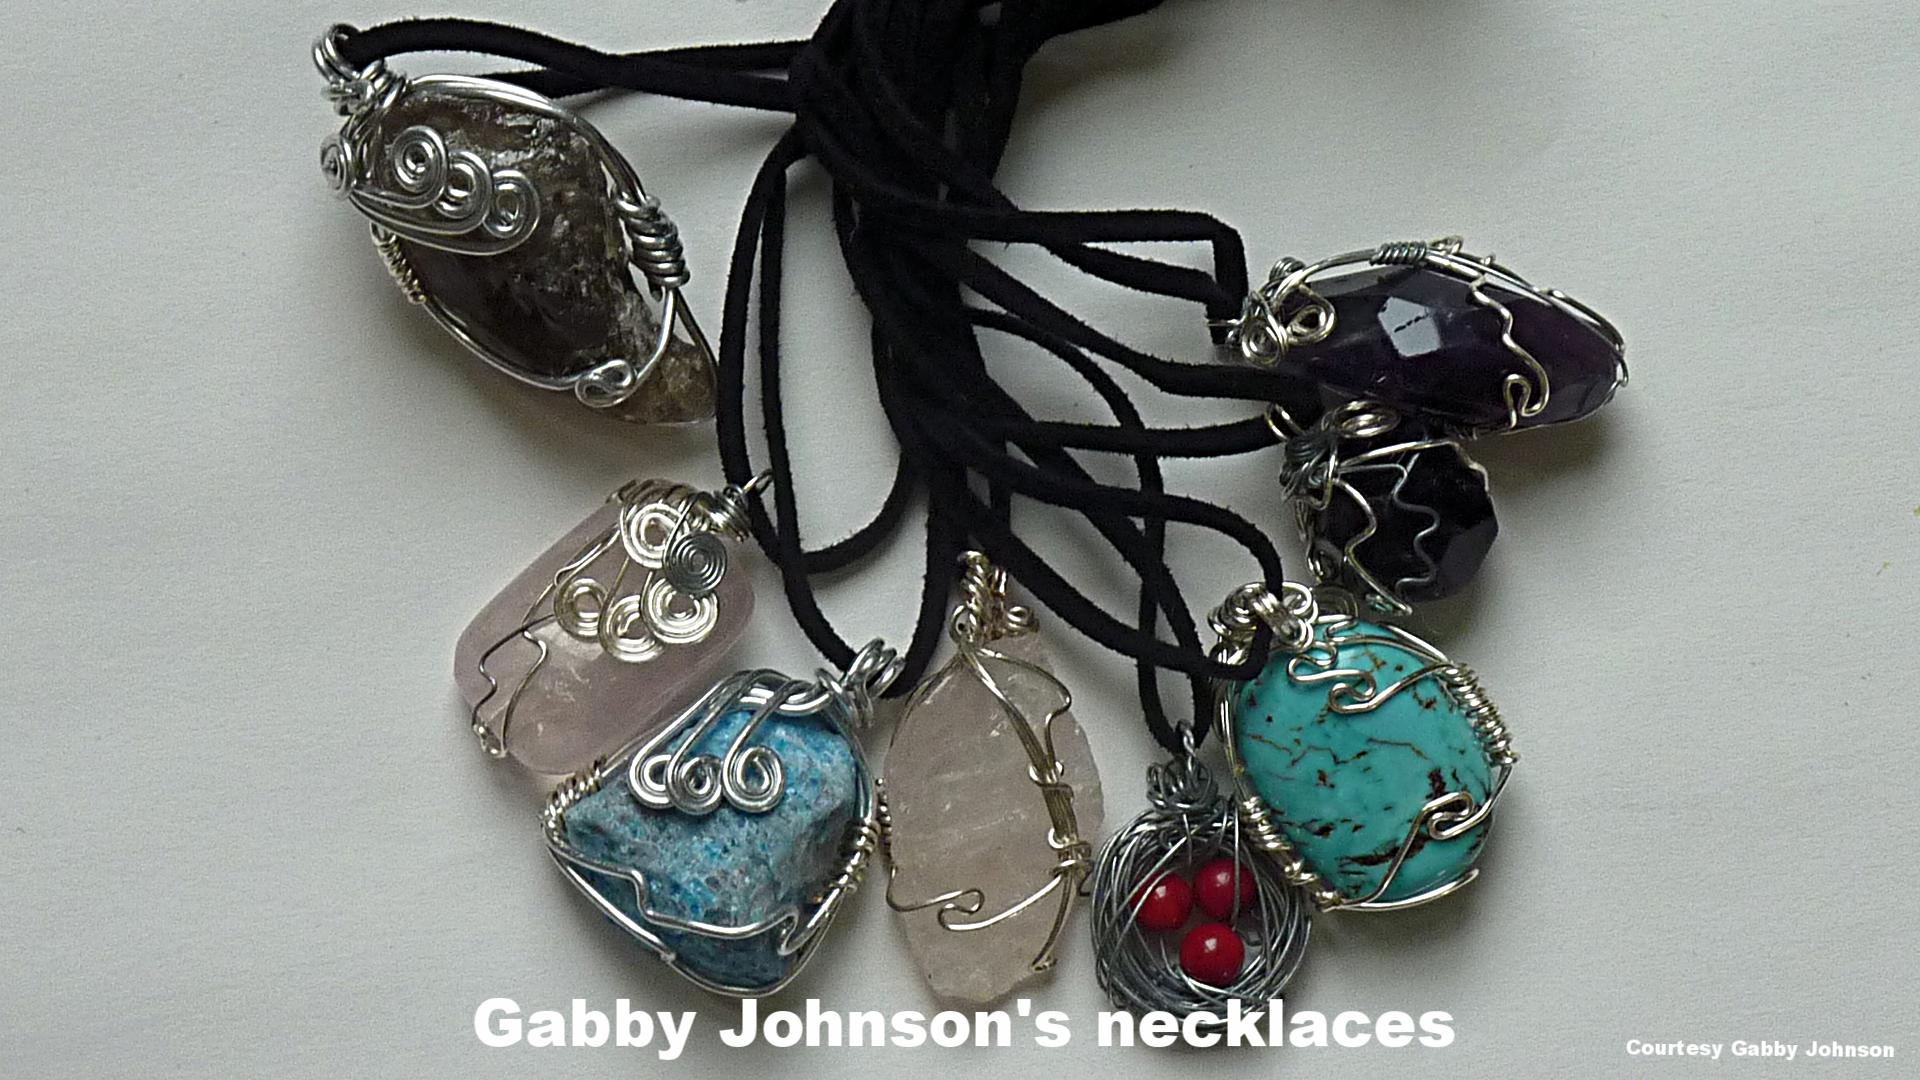 Gabby Johnson's jewelry